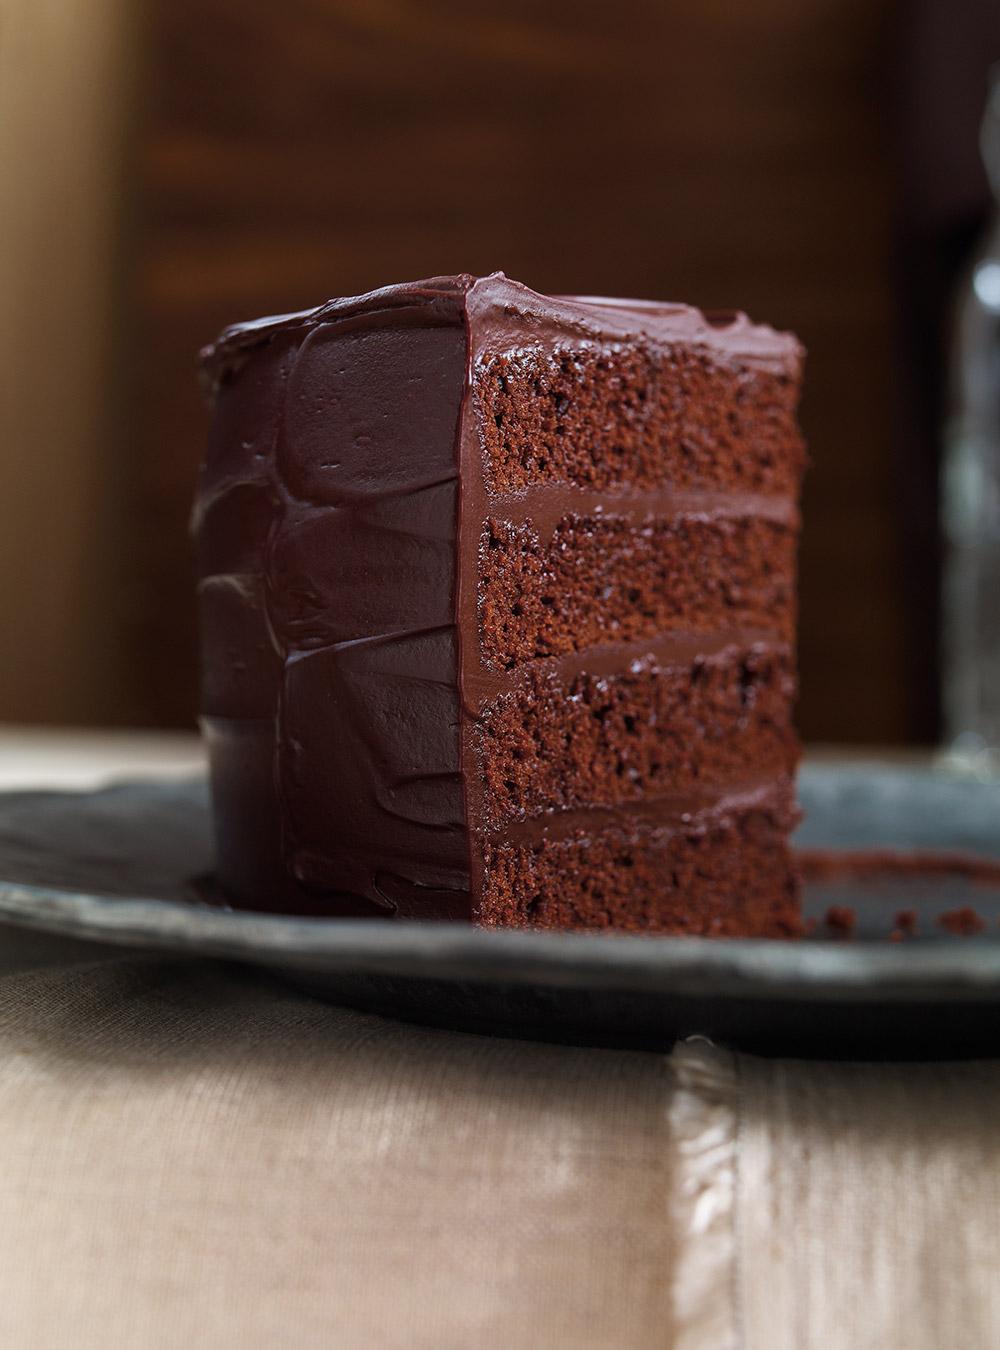 Gâteau au chocolat (le meilleur) | ricardo